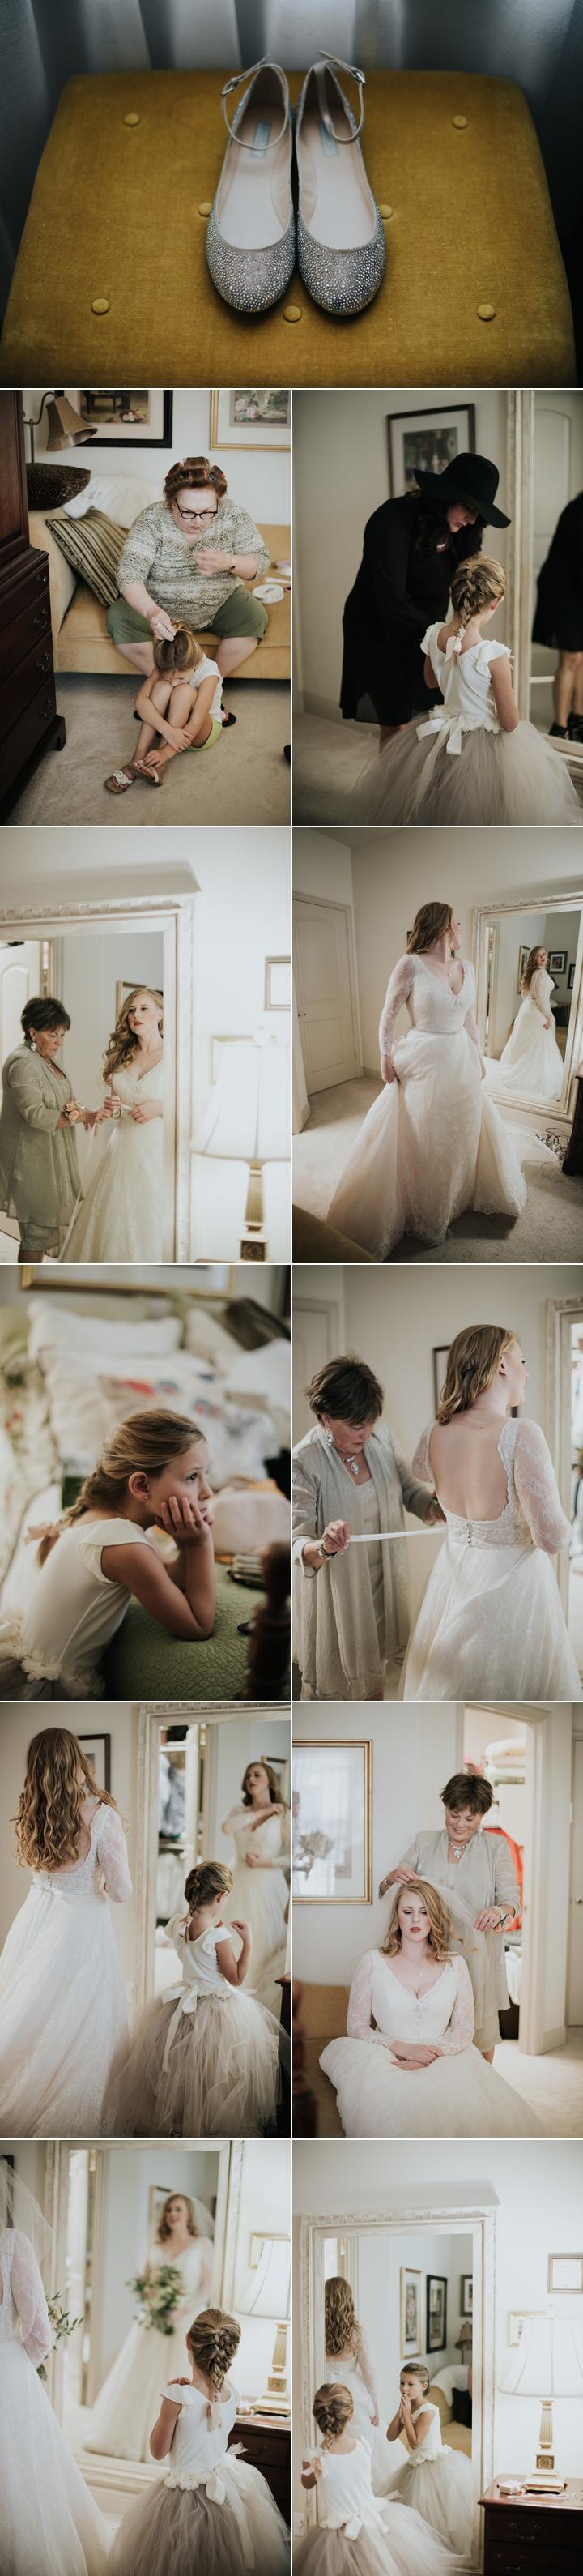 dallas-wedding-photographers-vb 5.jpg